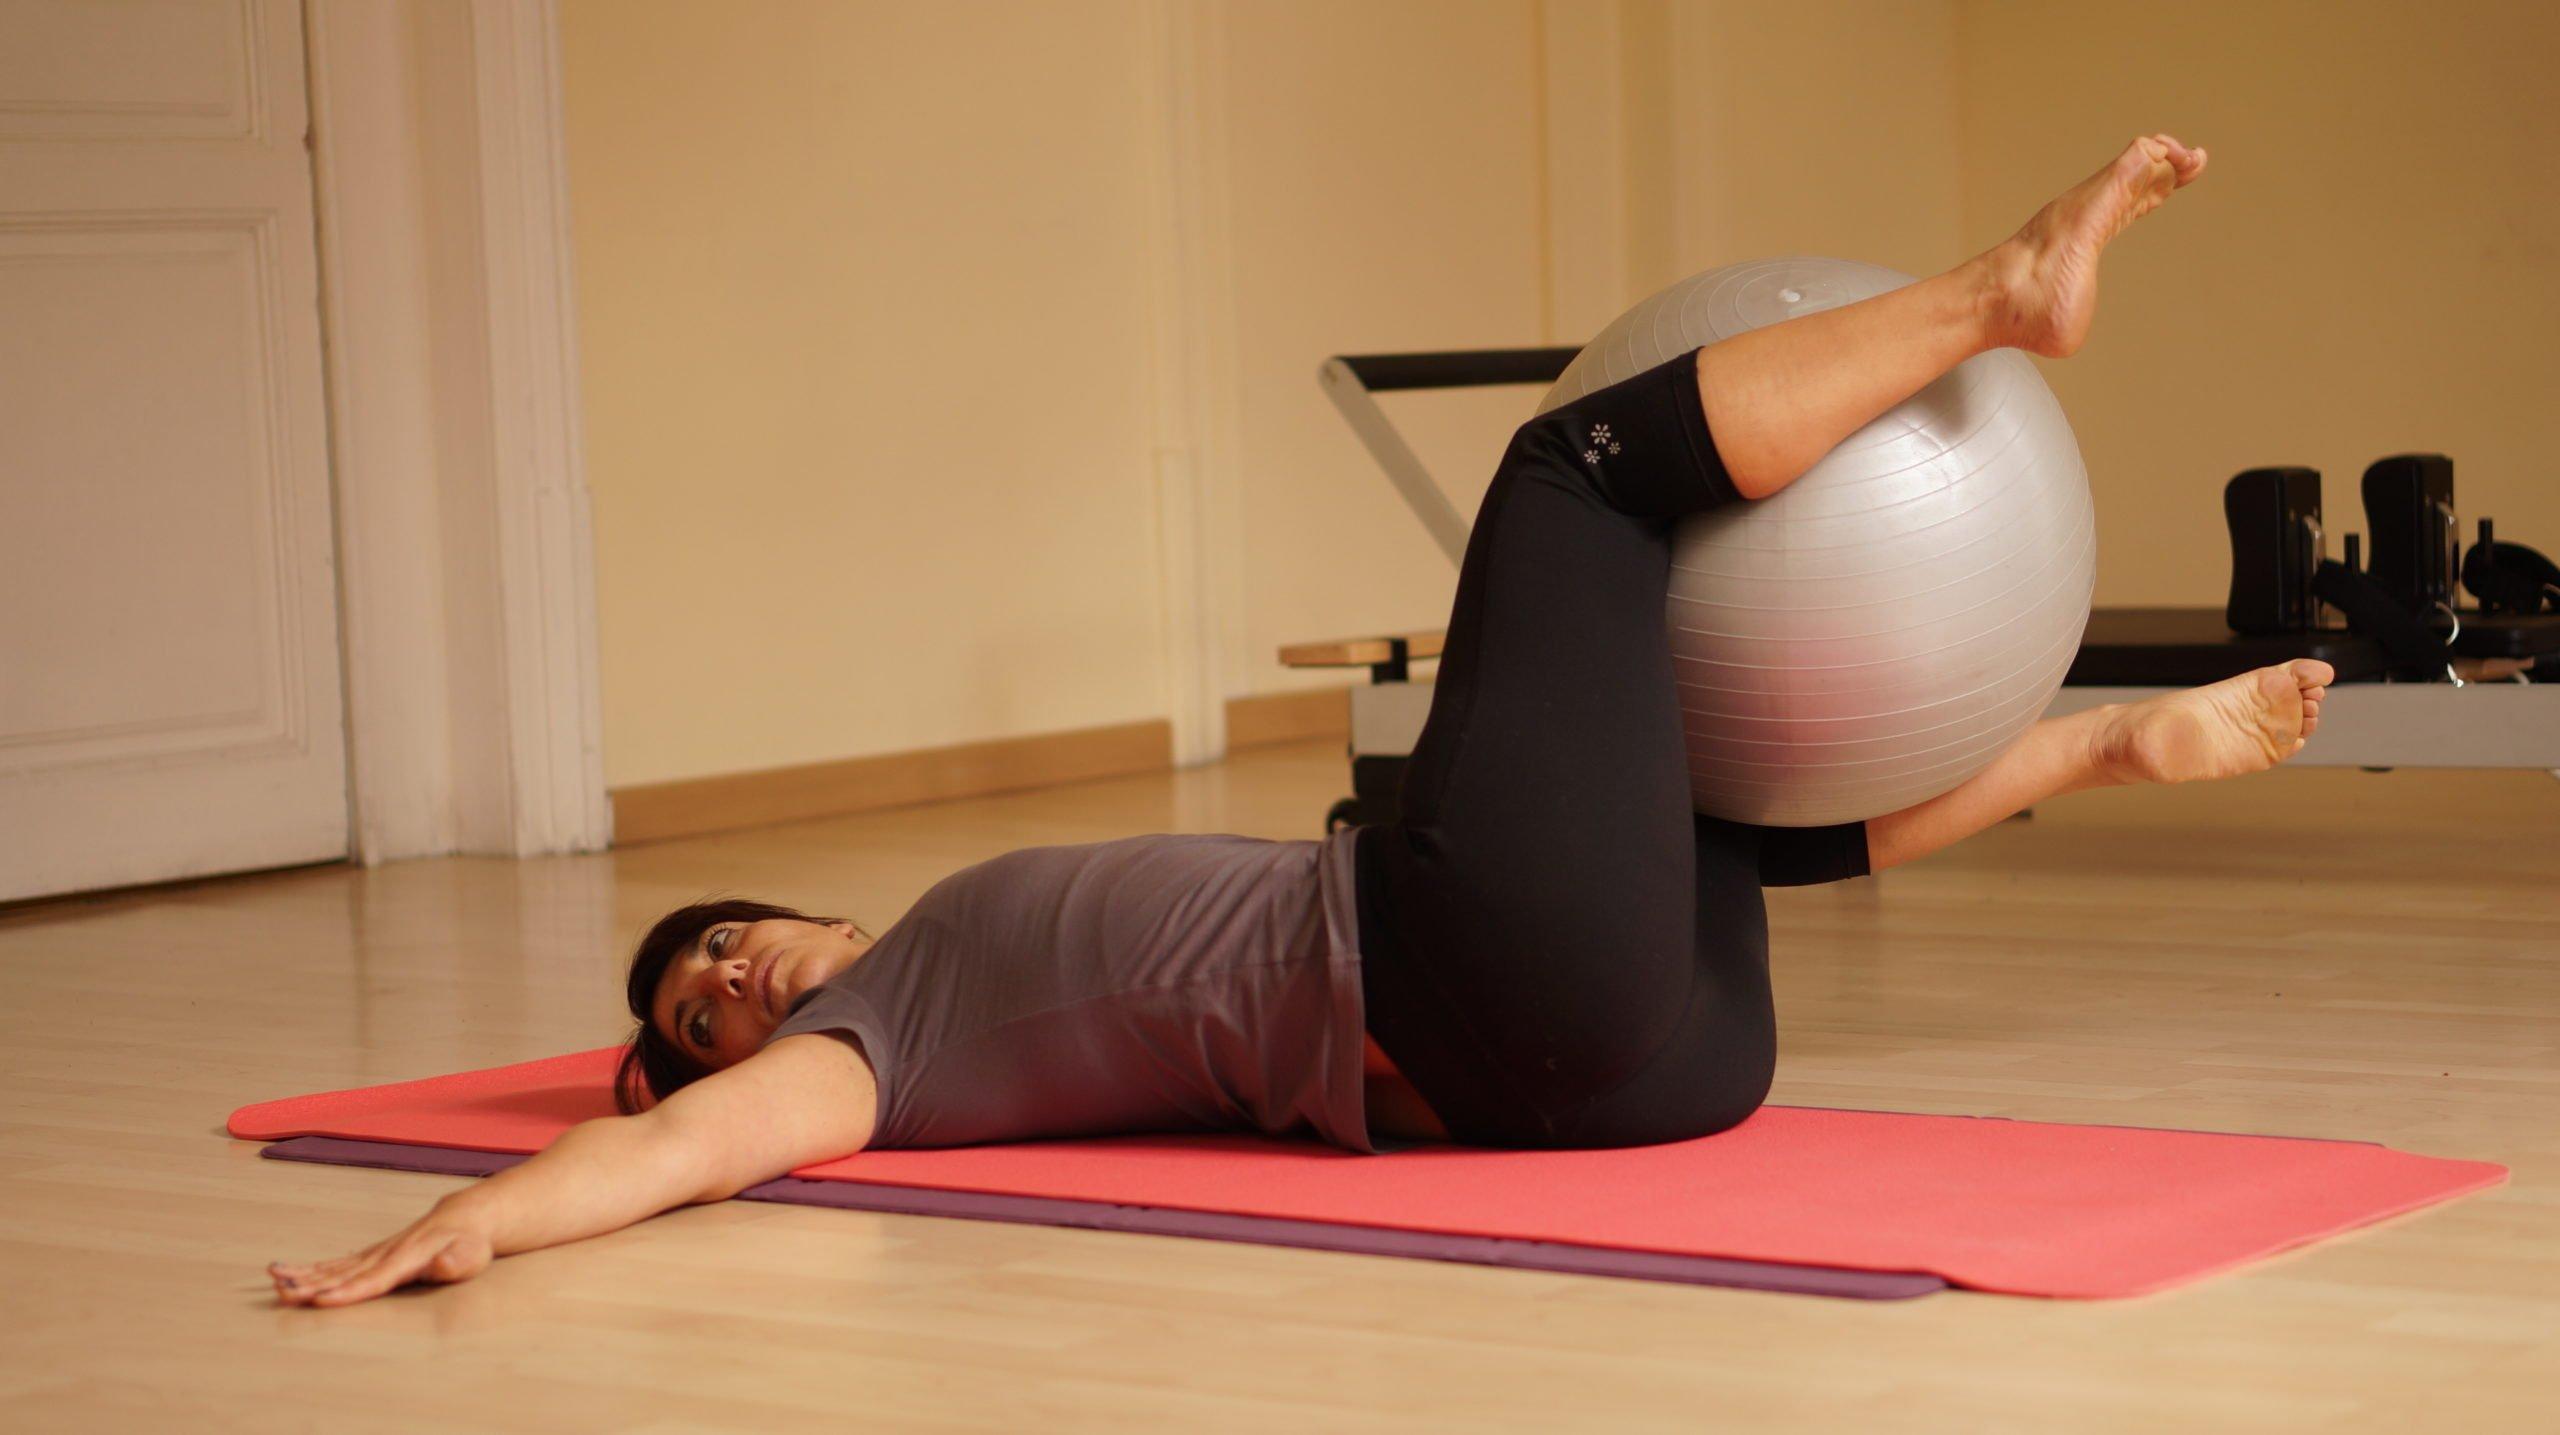 Pilates reduces siatica pain - small groups or pricvate cclasses